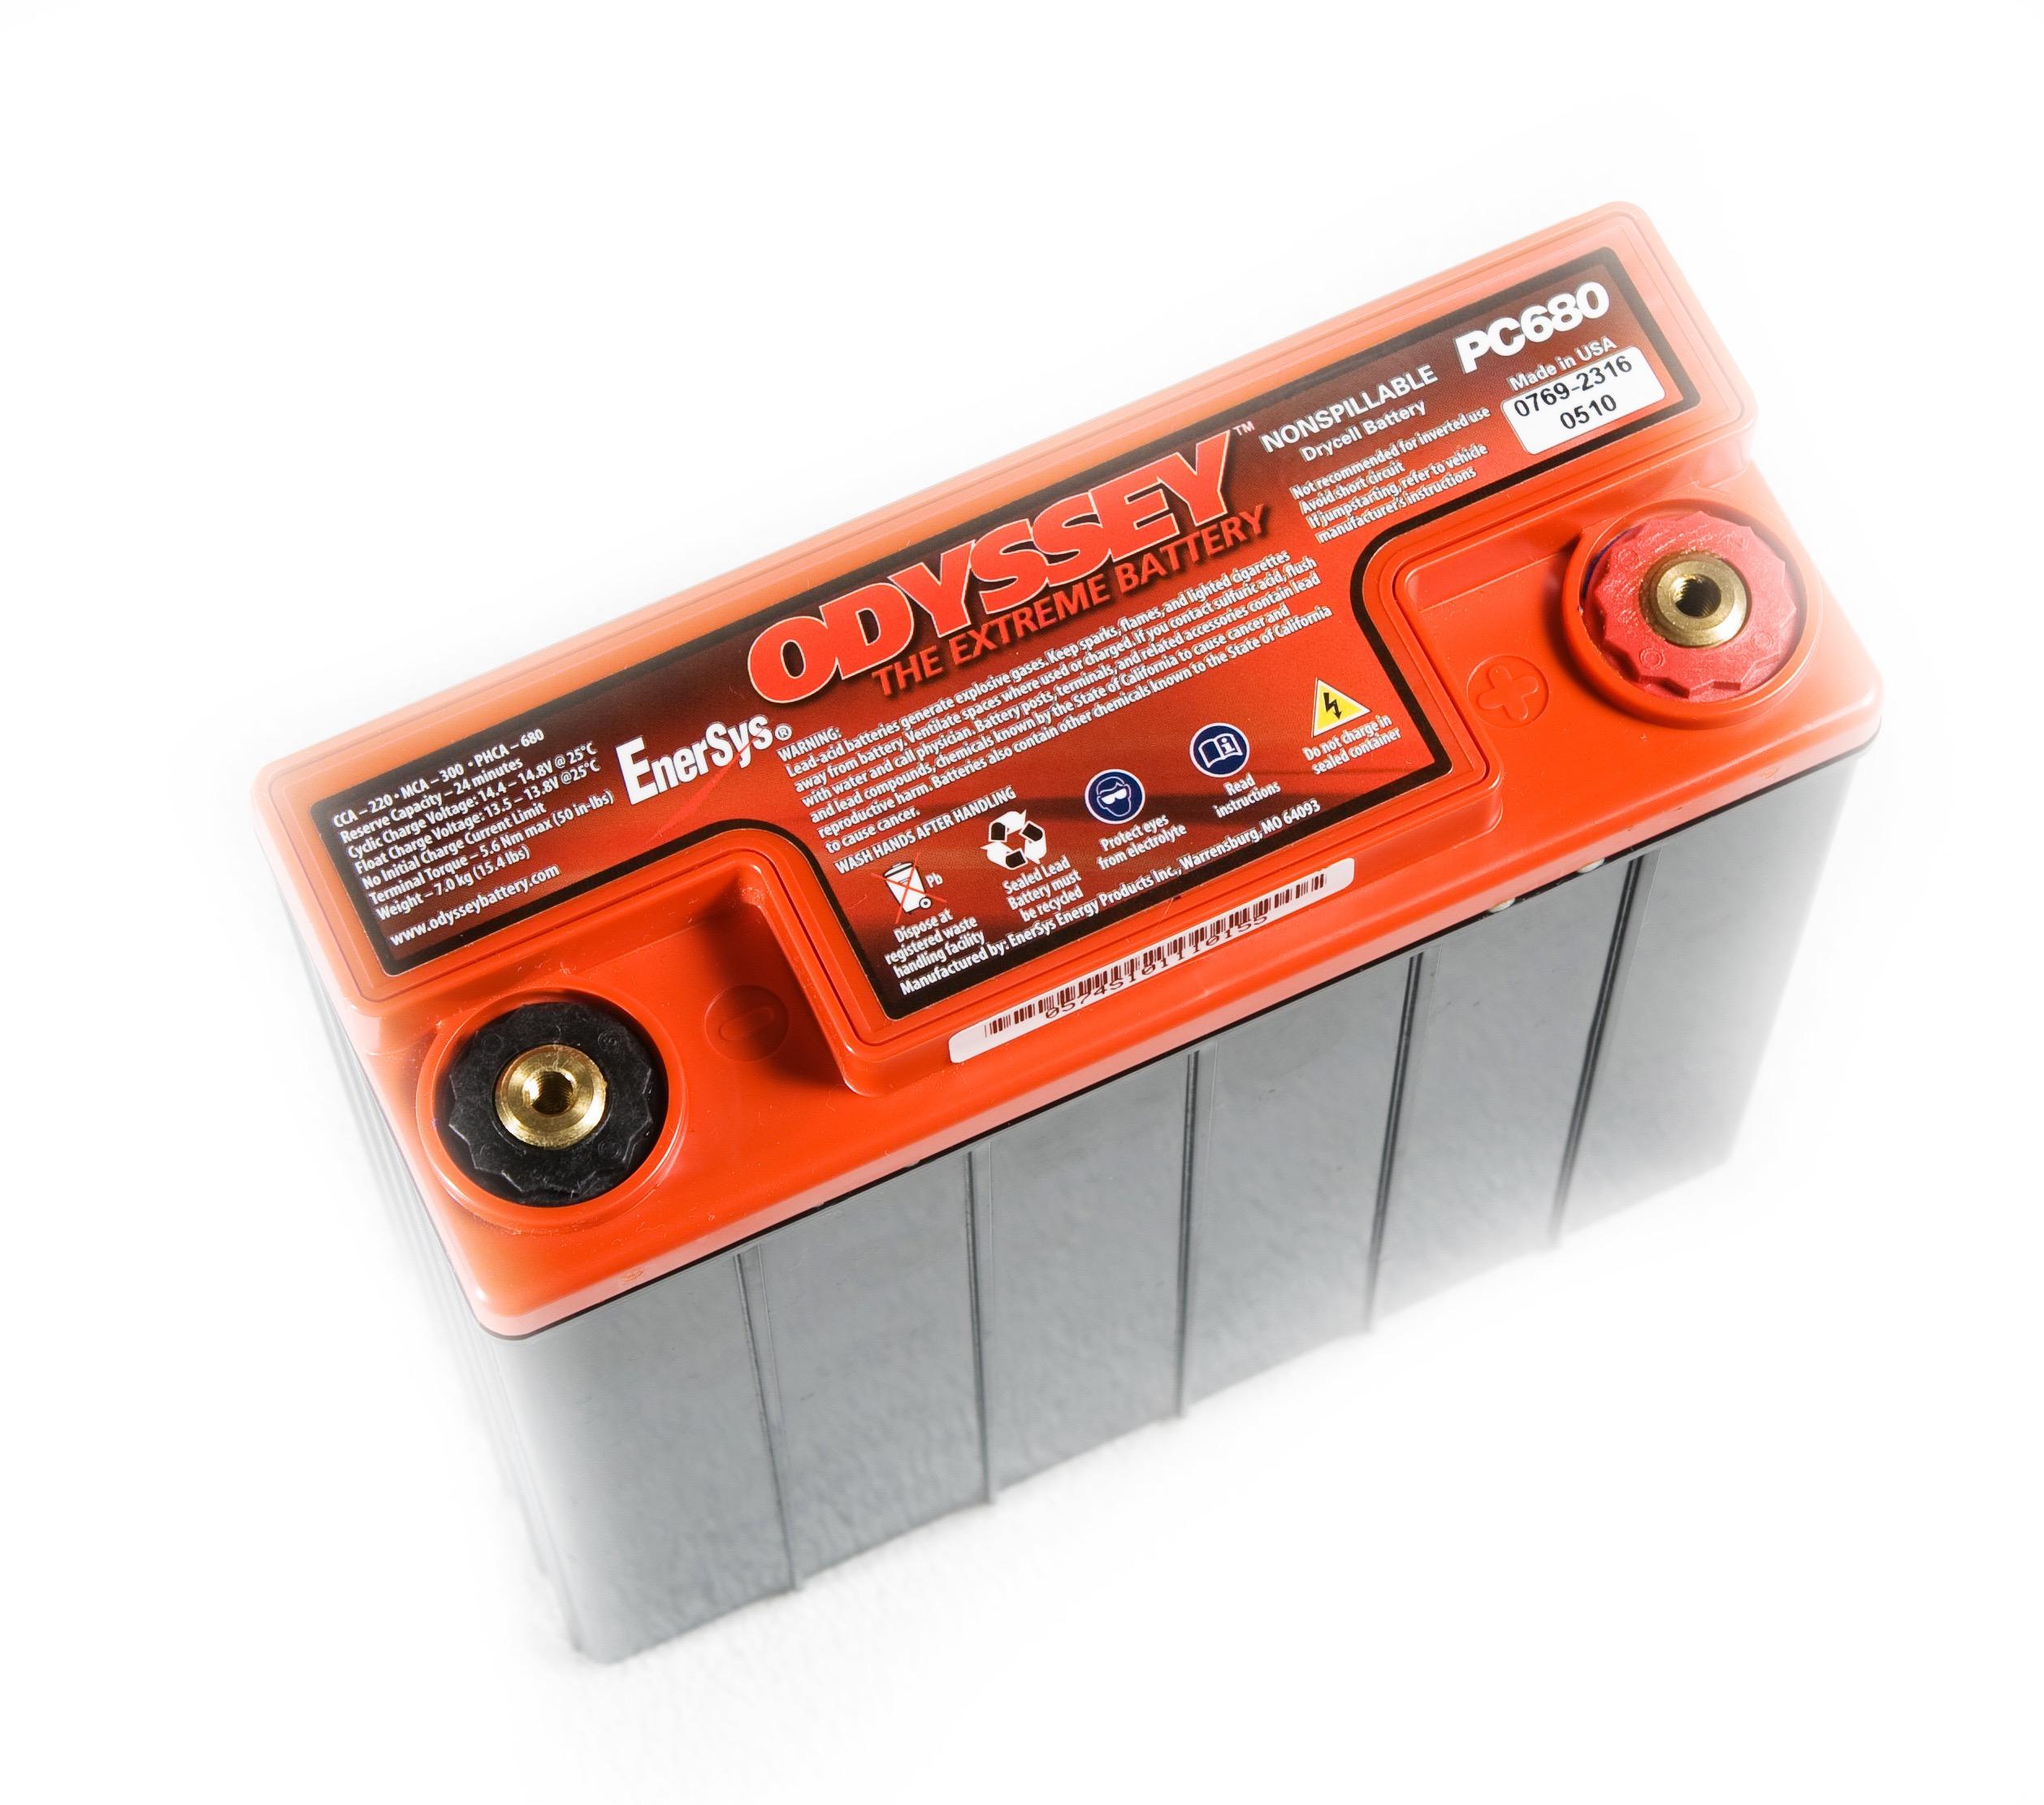 Racing Batterie - Odyssey PC 680 / USA